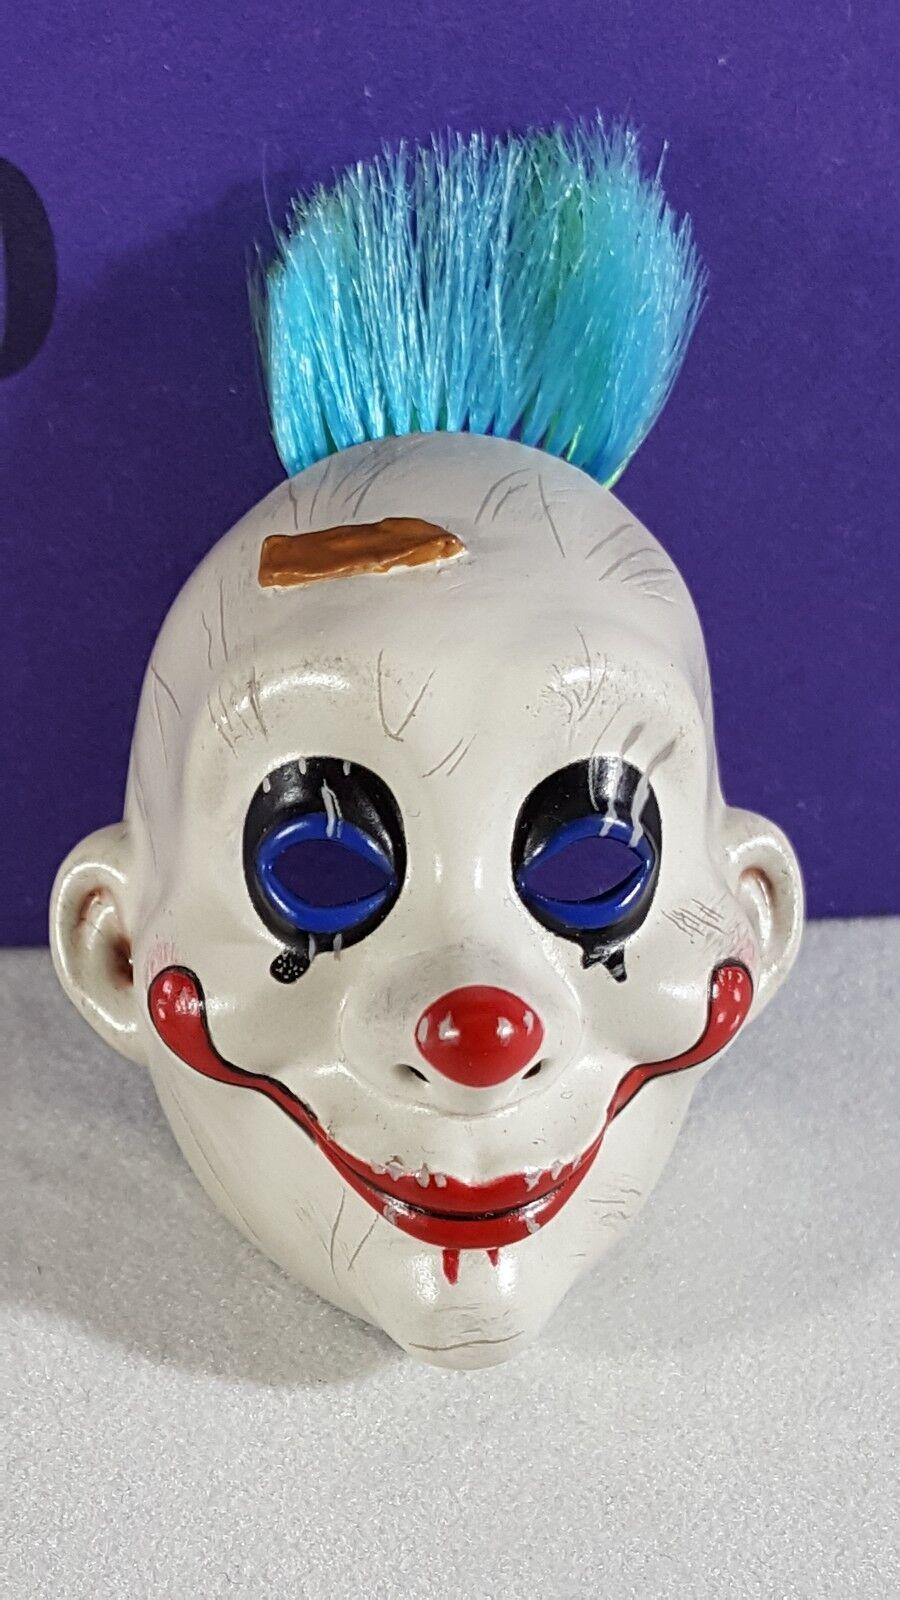 Hot Toys Exclusive DX11 Dark Knight 1 6 Joker 2.0 Action Figure Le Masque de clown